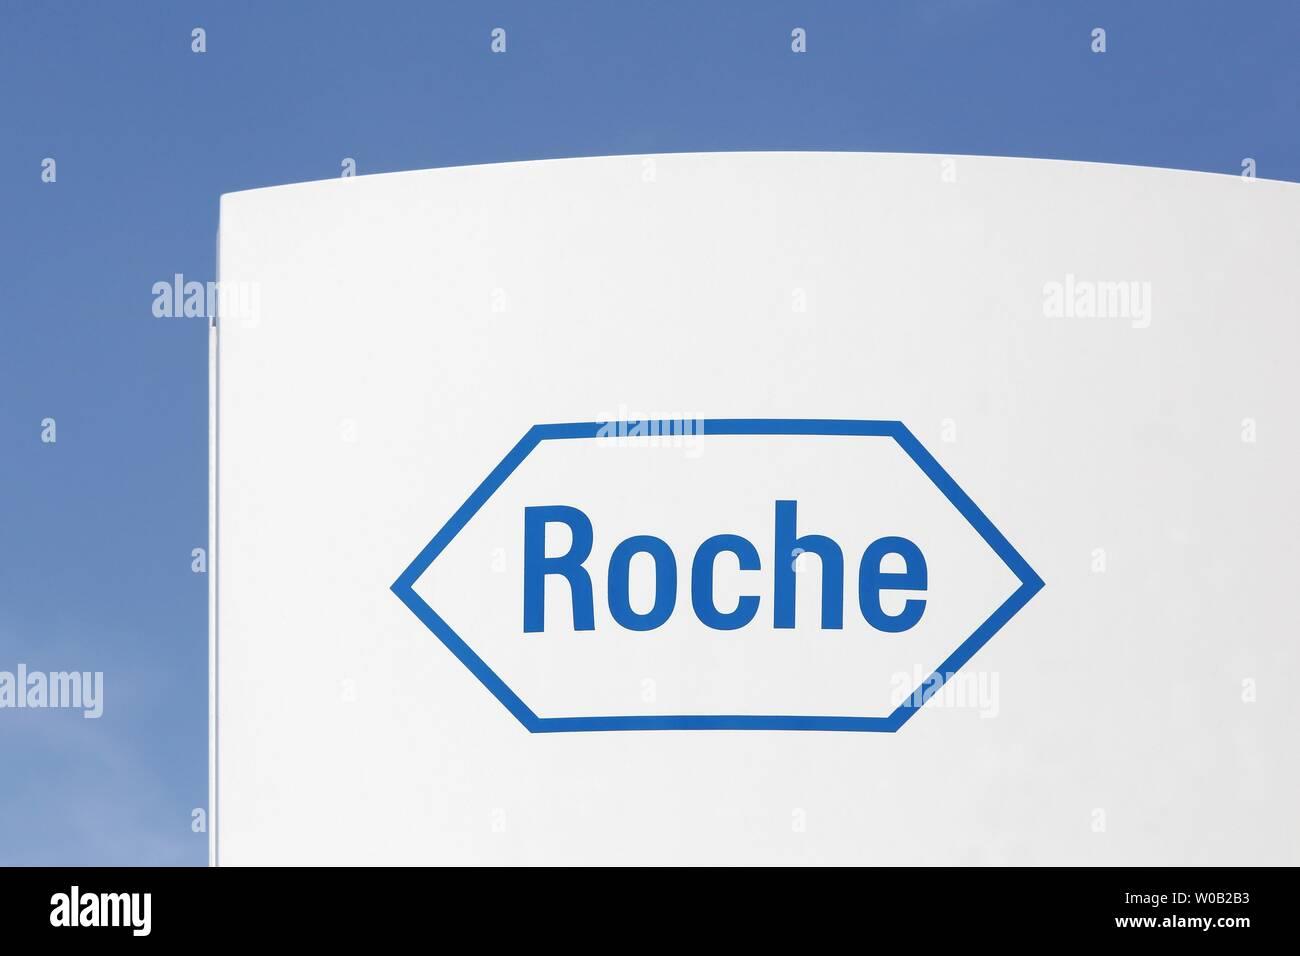 Hoffmann La Roche Stock Photos & Hoffmann La Roche Stock Images - Alamy